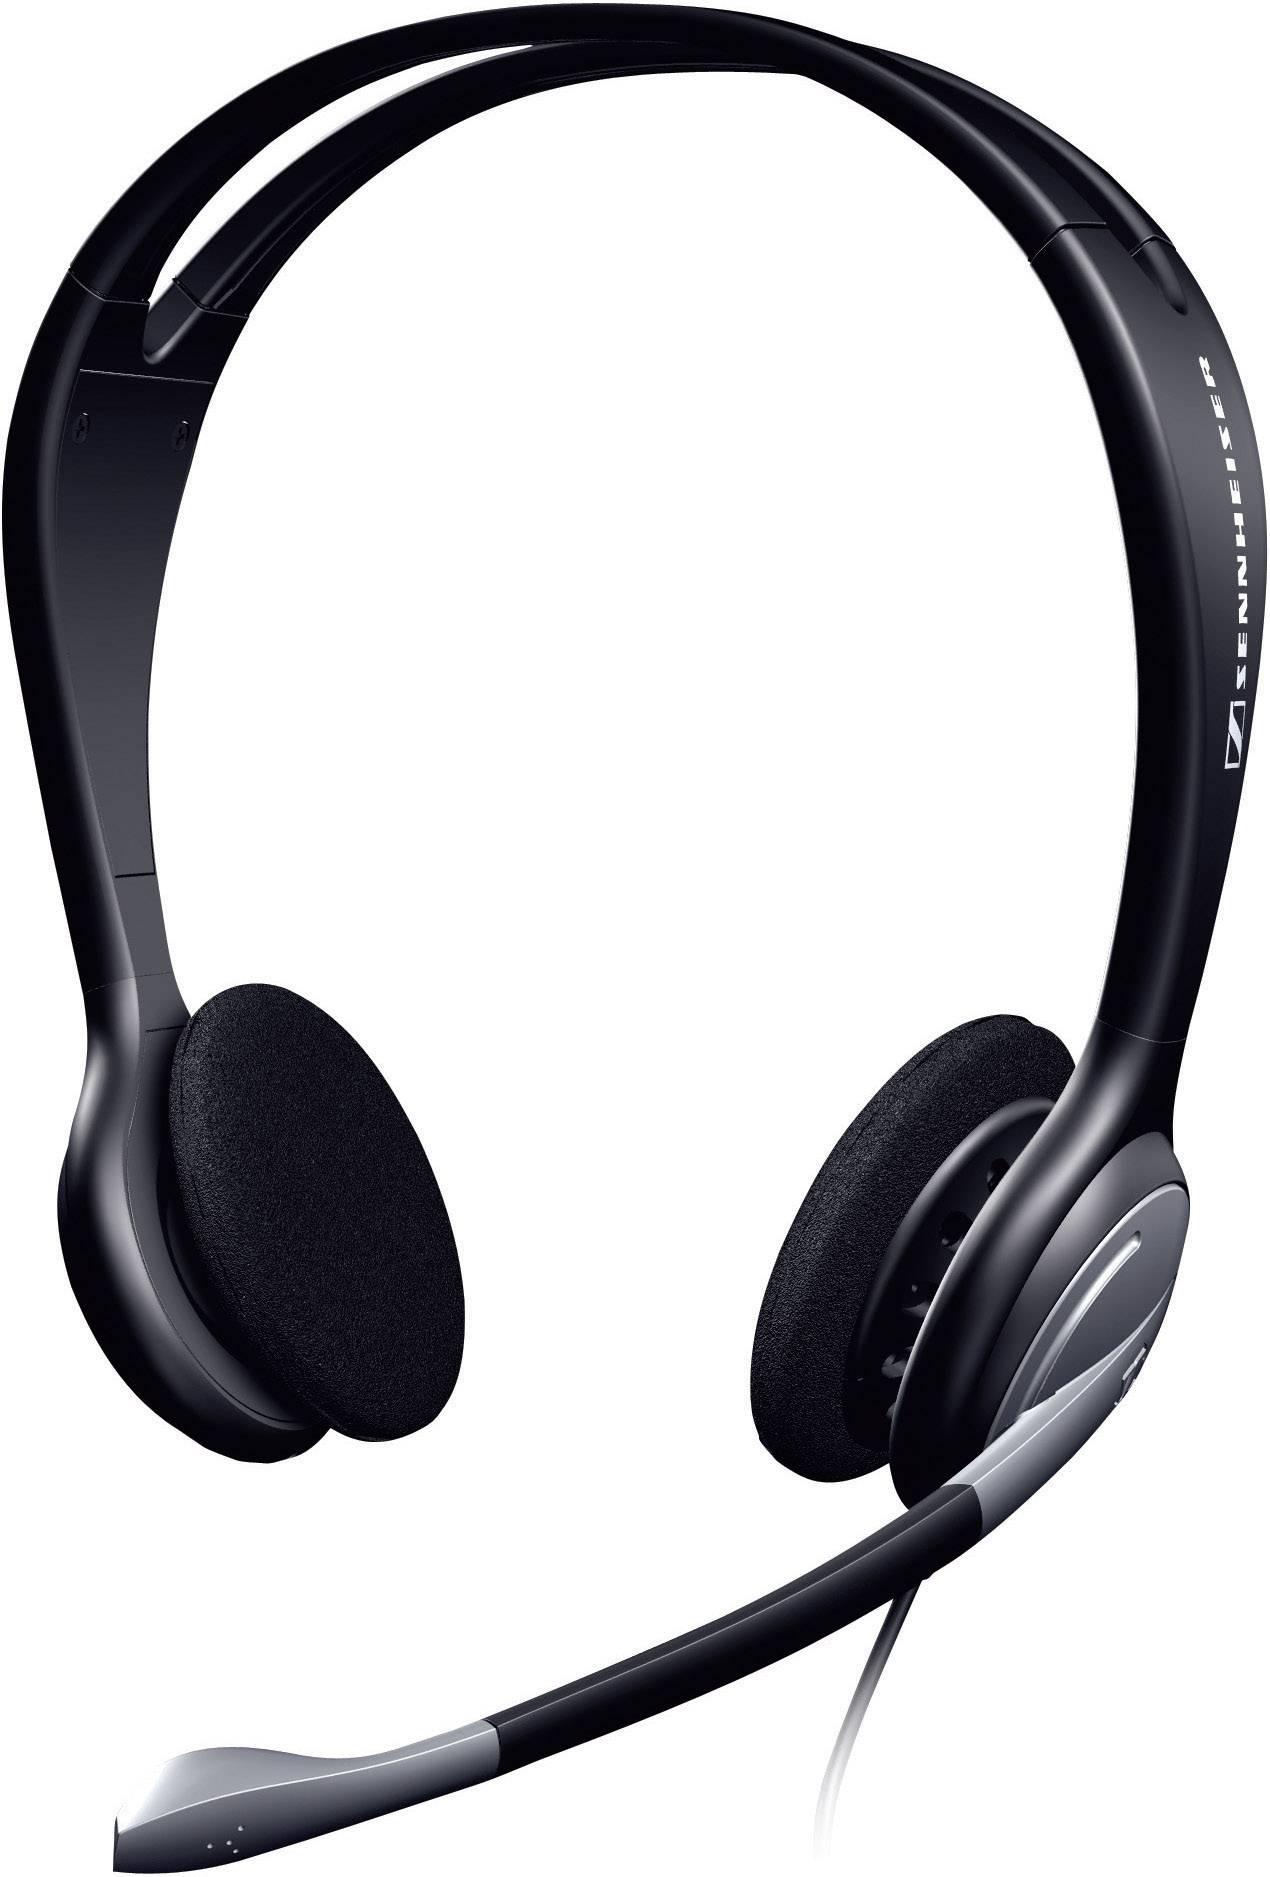 Headset k PC Sennheiser PC 131, čierna